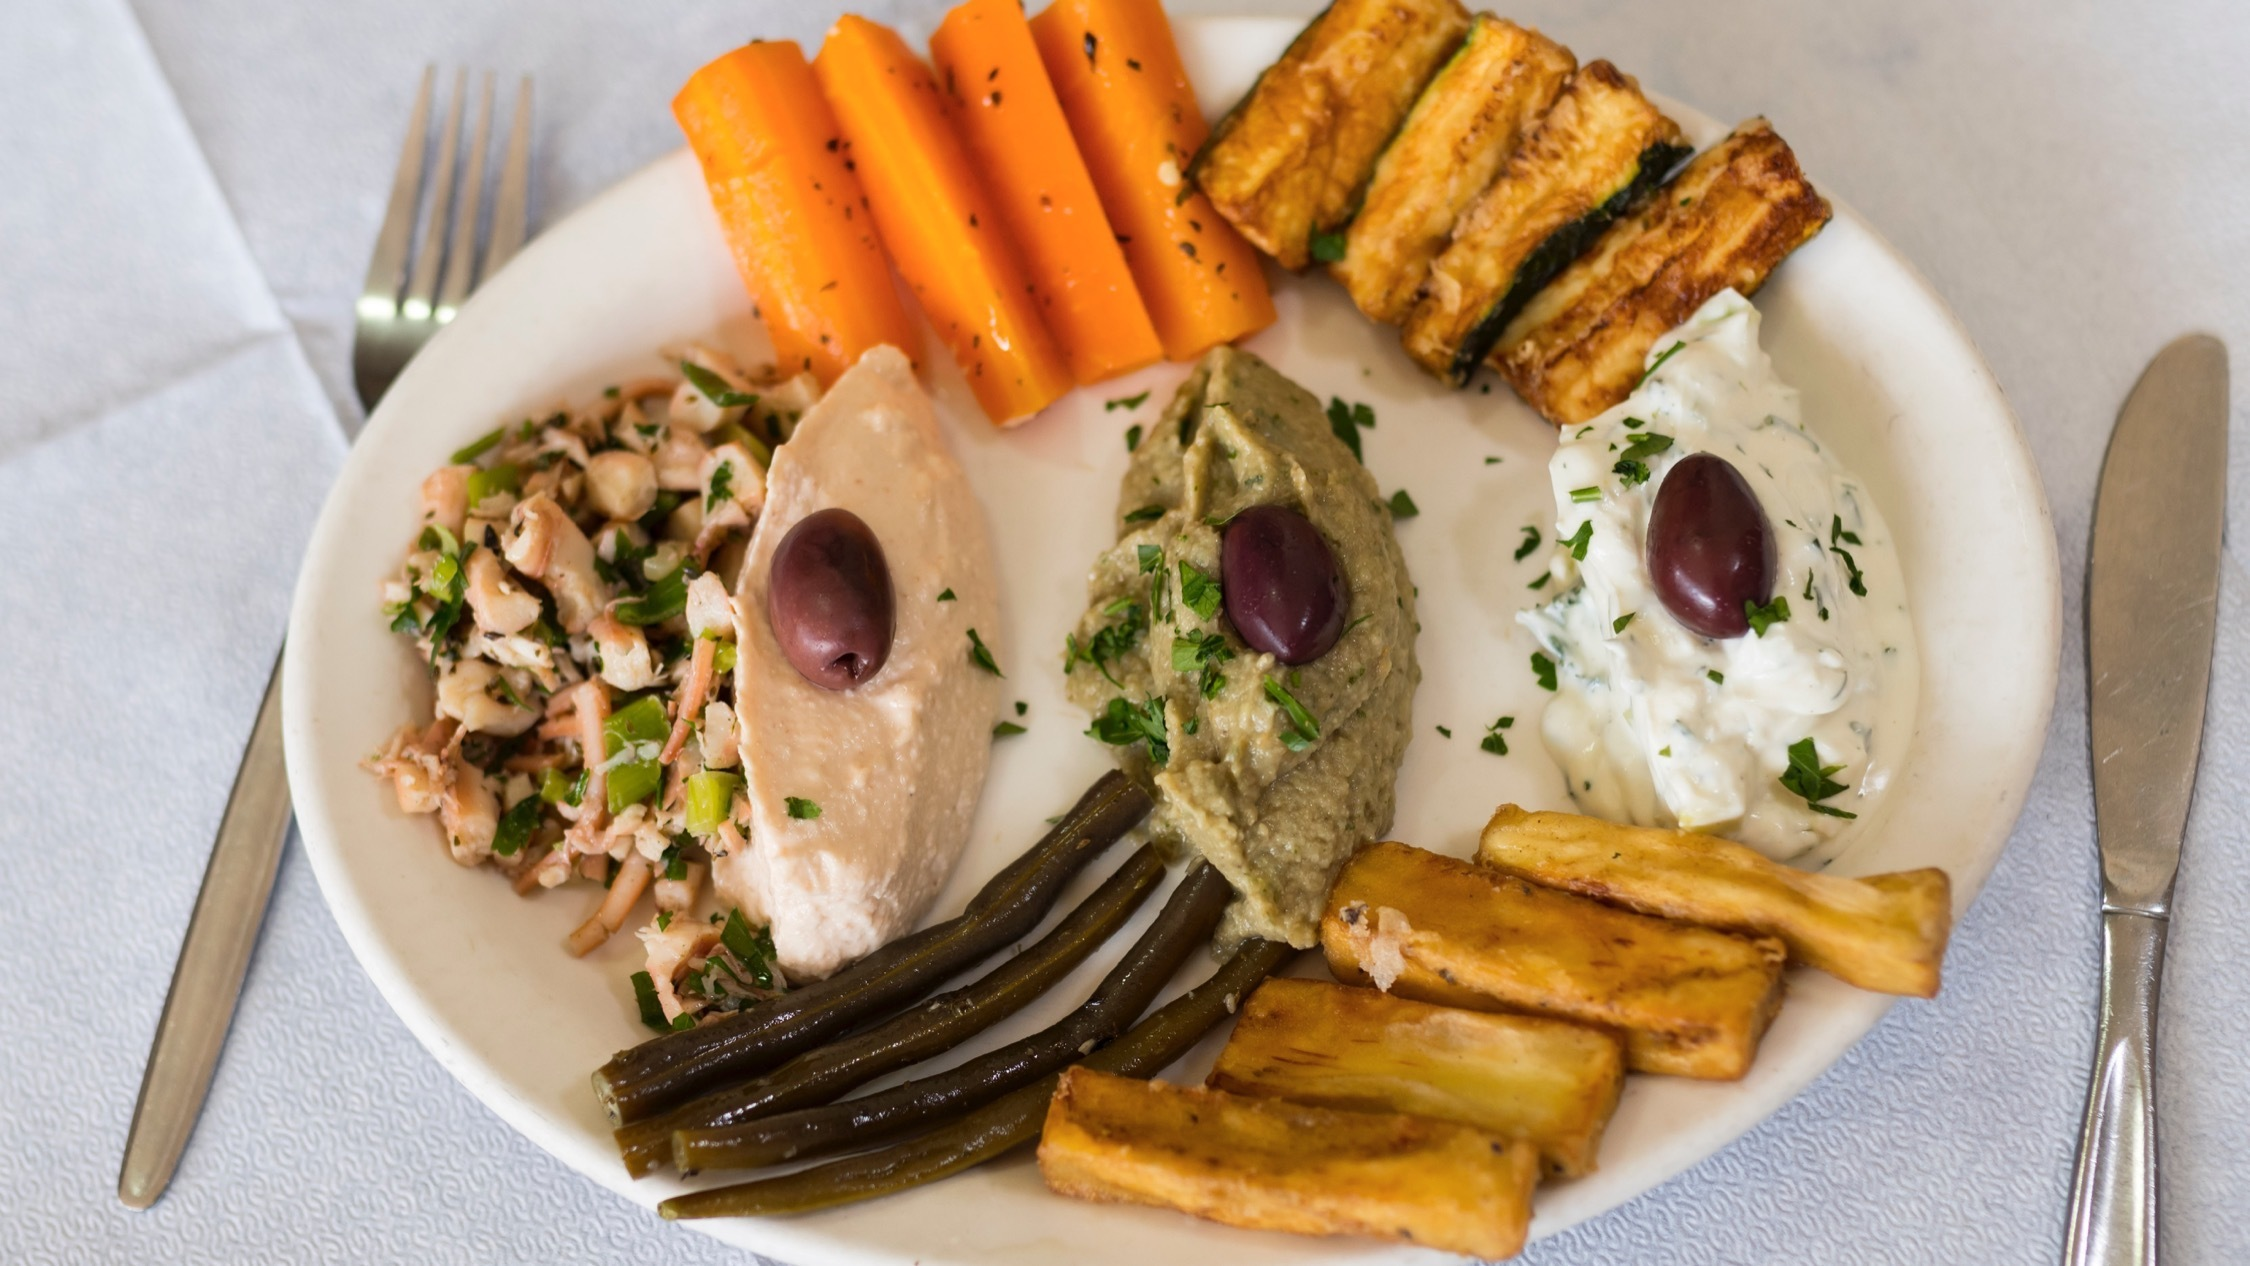 Food at Jims Greek Tavern Melbourne